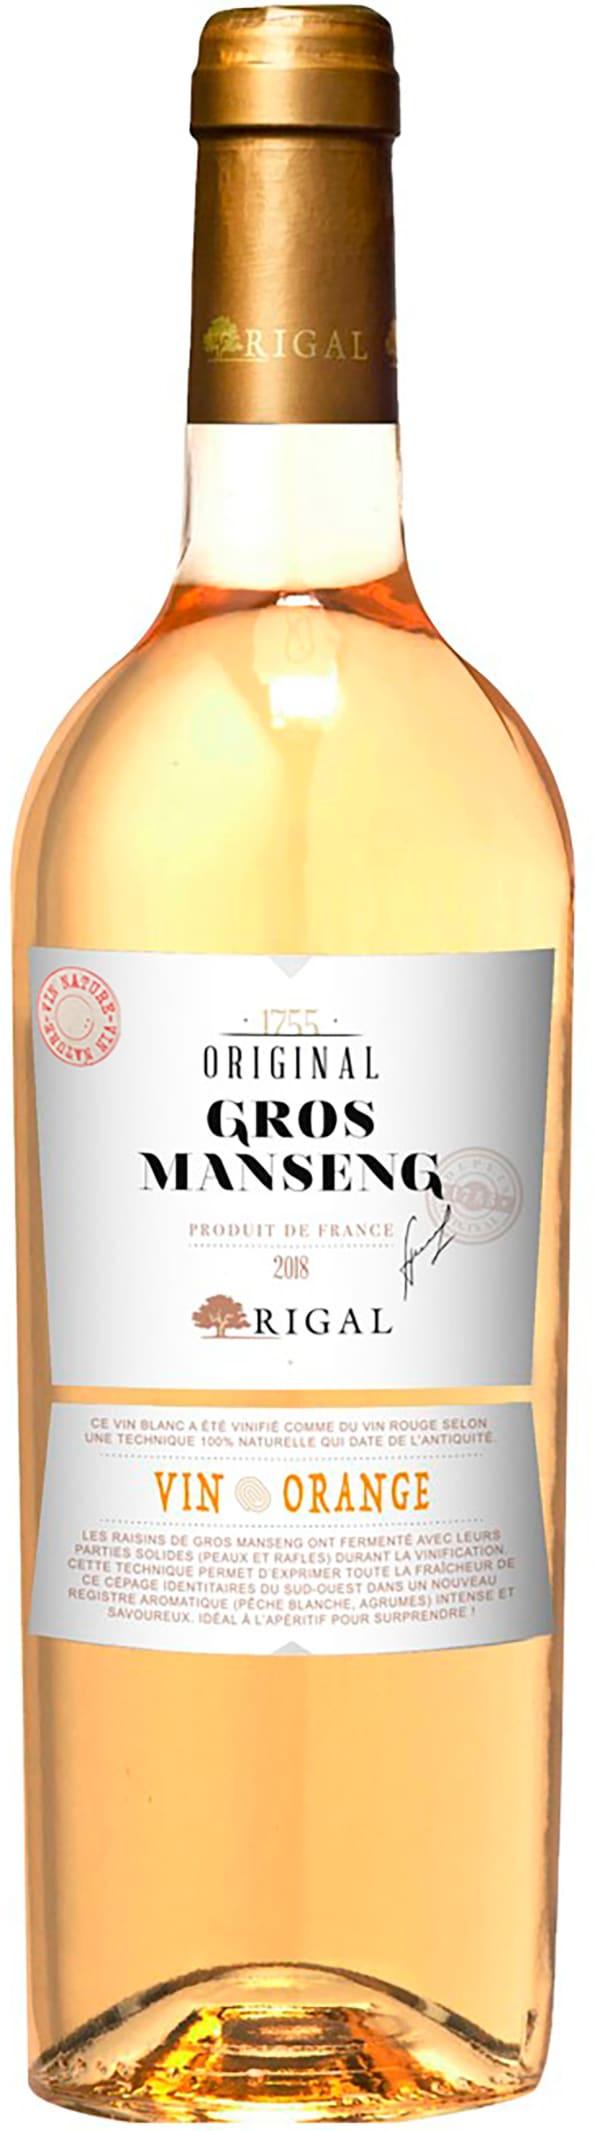 Rigal Original Gros Manseng Vin Orange 2018